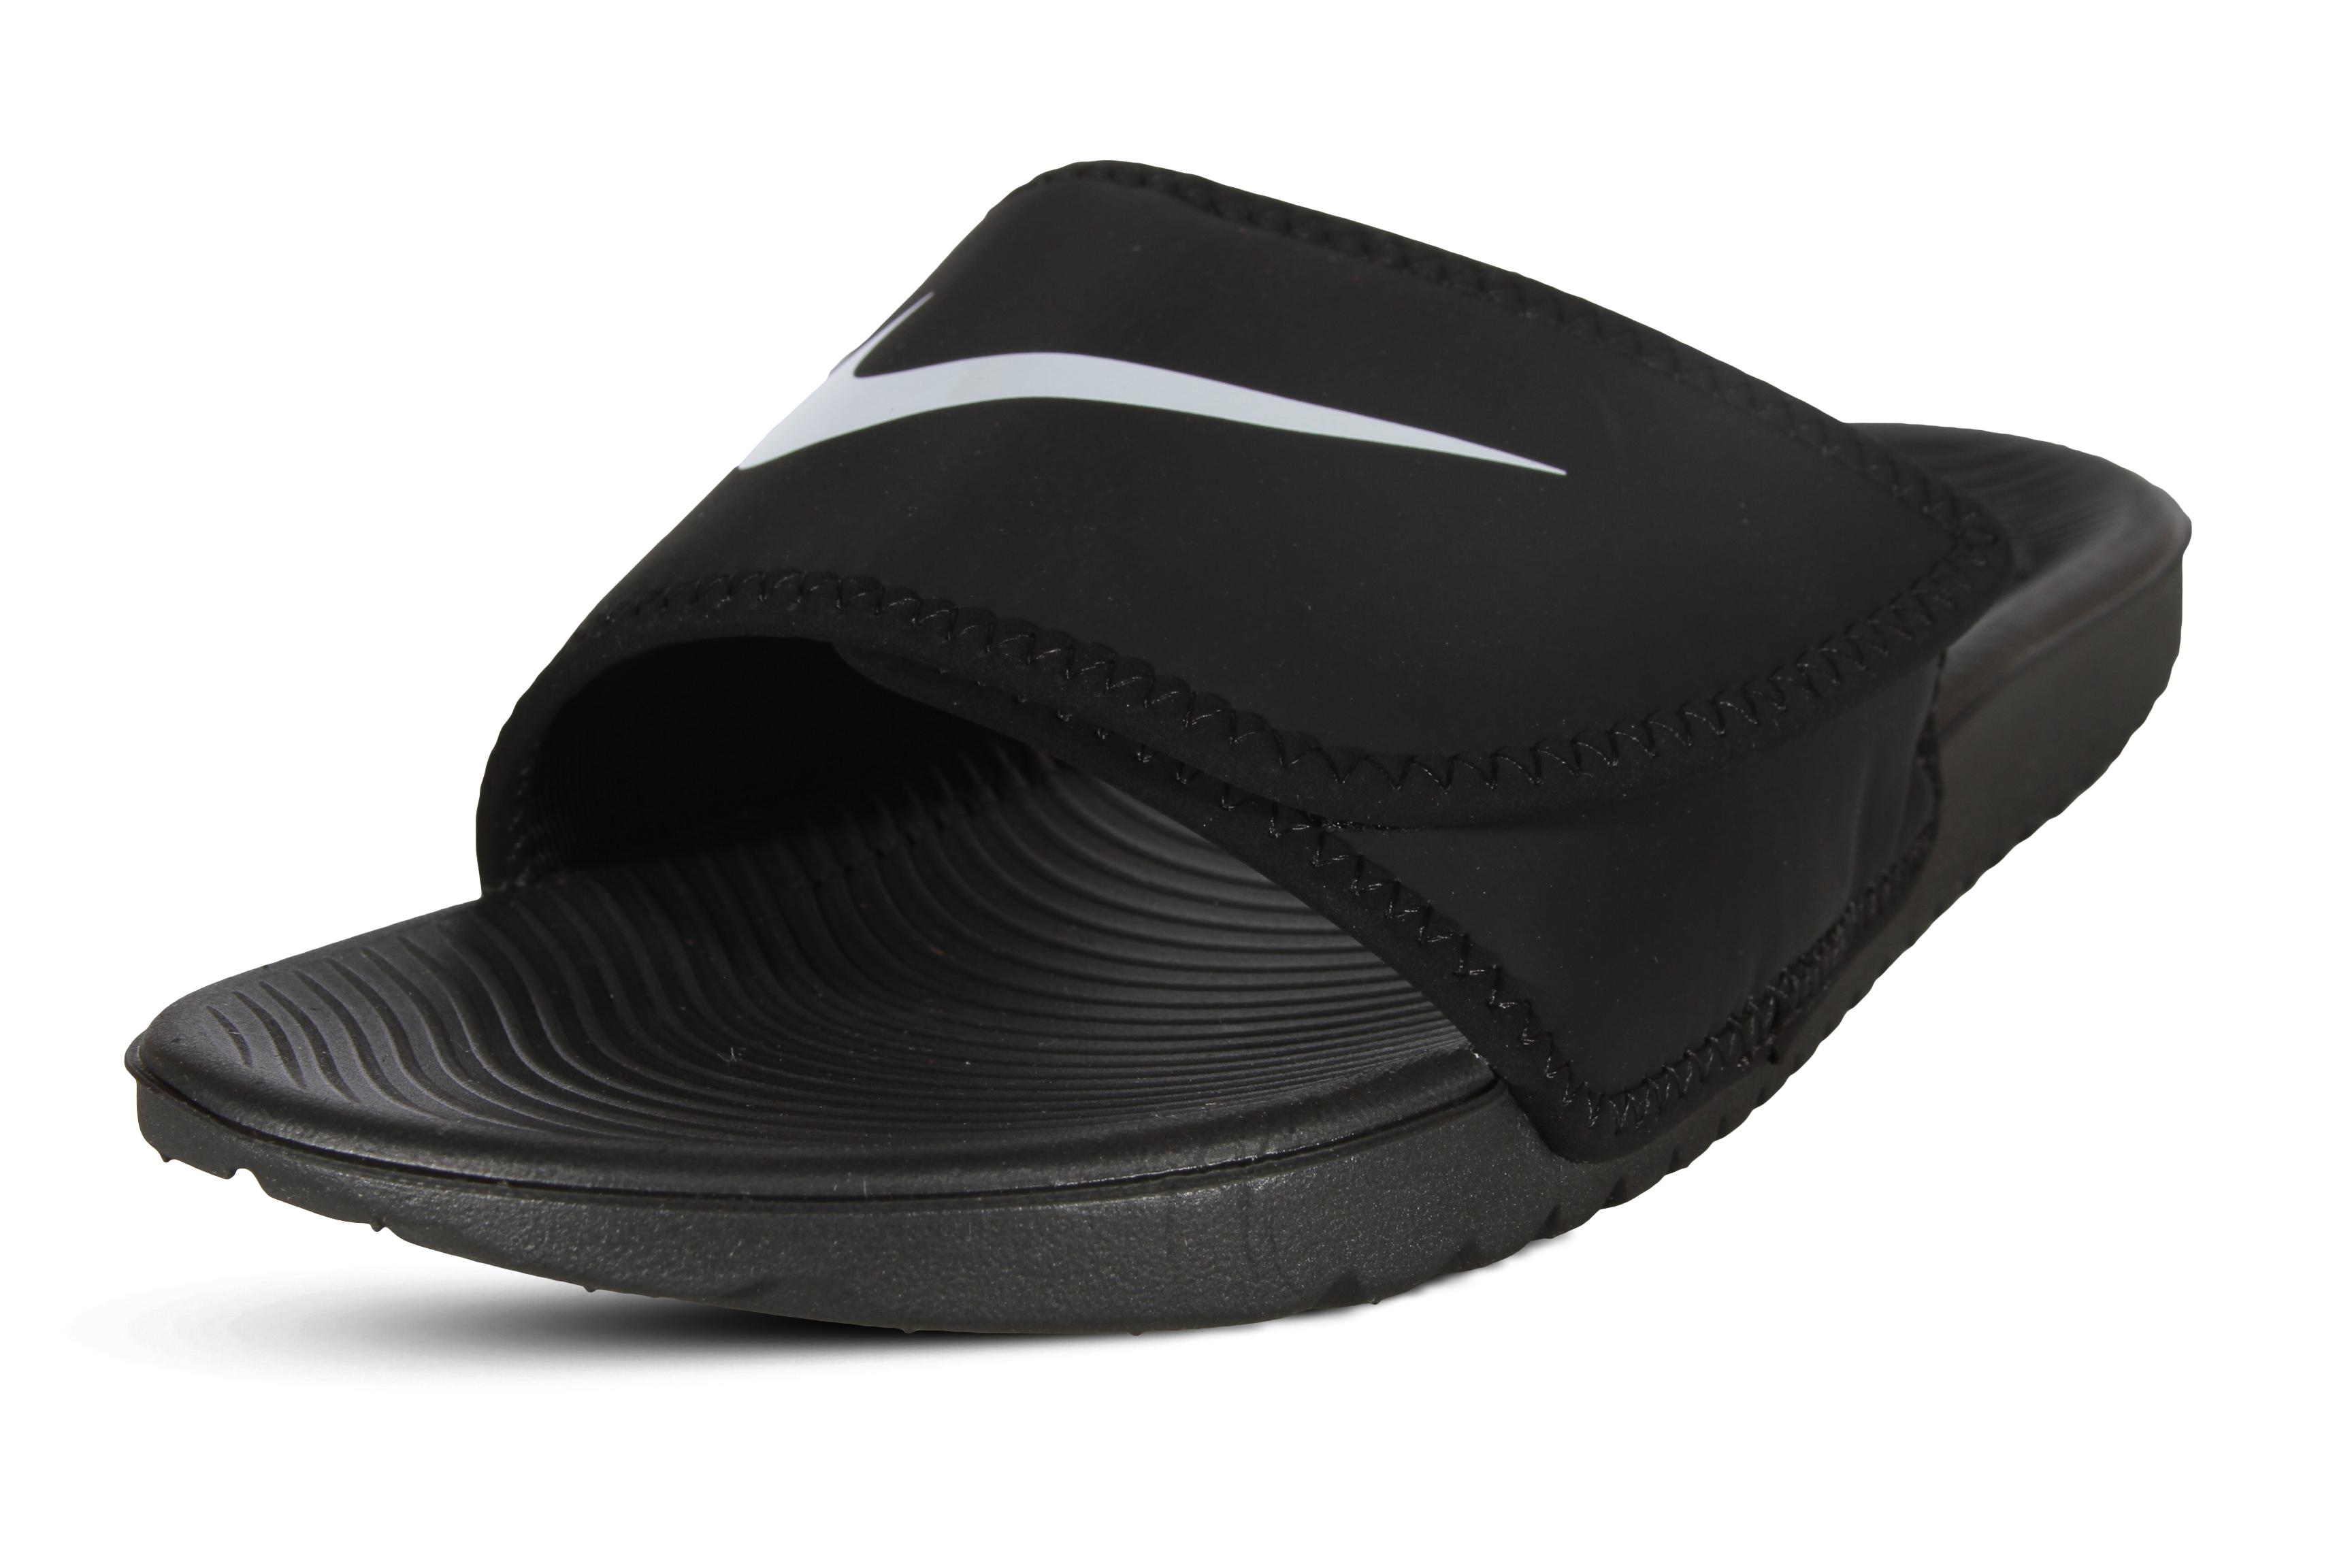 aa9ea57b8f1 Nike Kawa Adjust Slide Boys  Grade School Black white 19344001 6